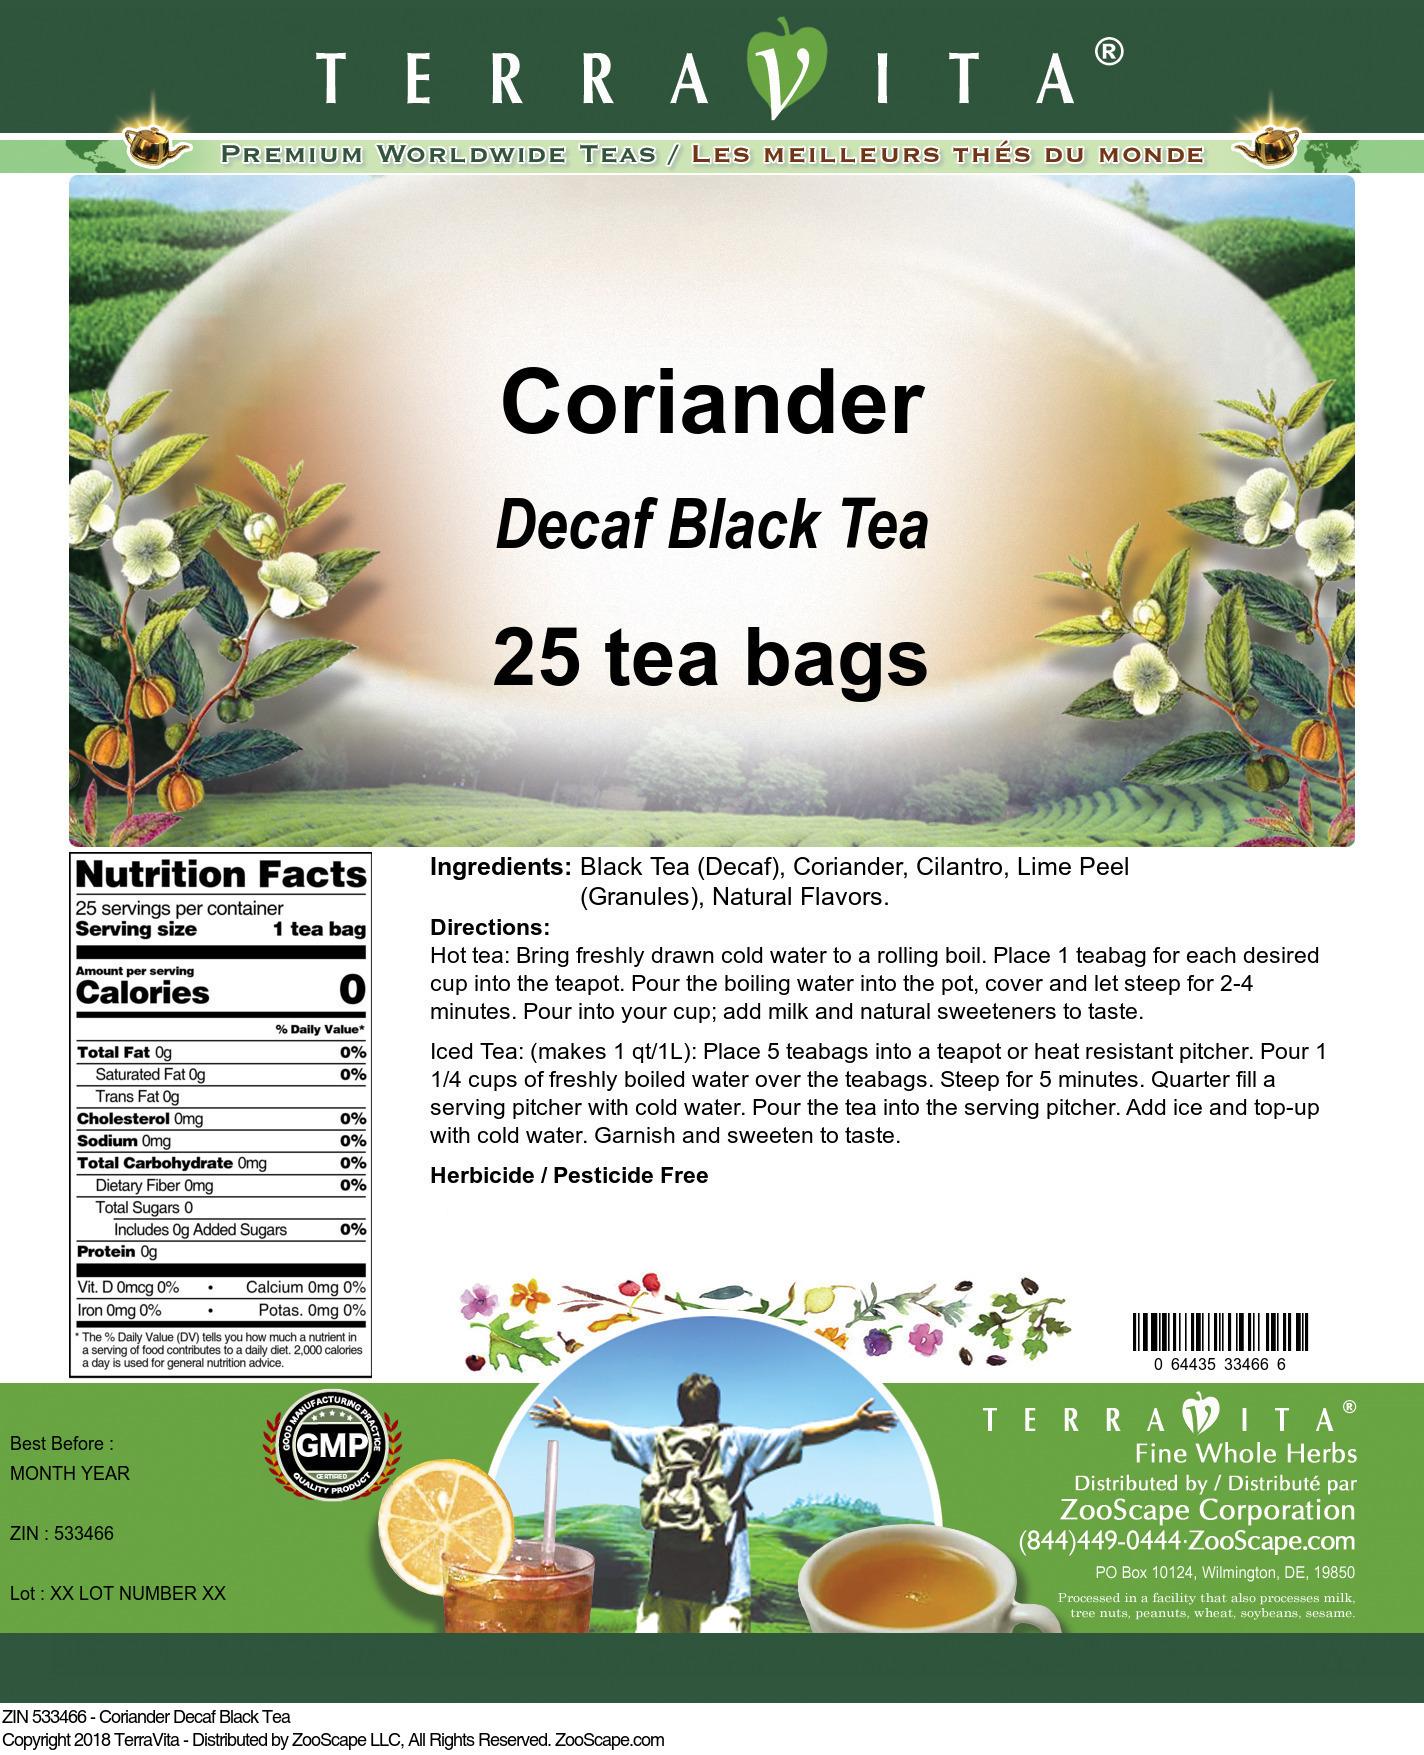 Coriander Decaf Black Tea